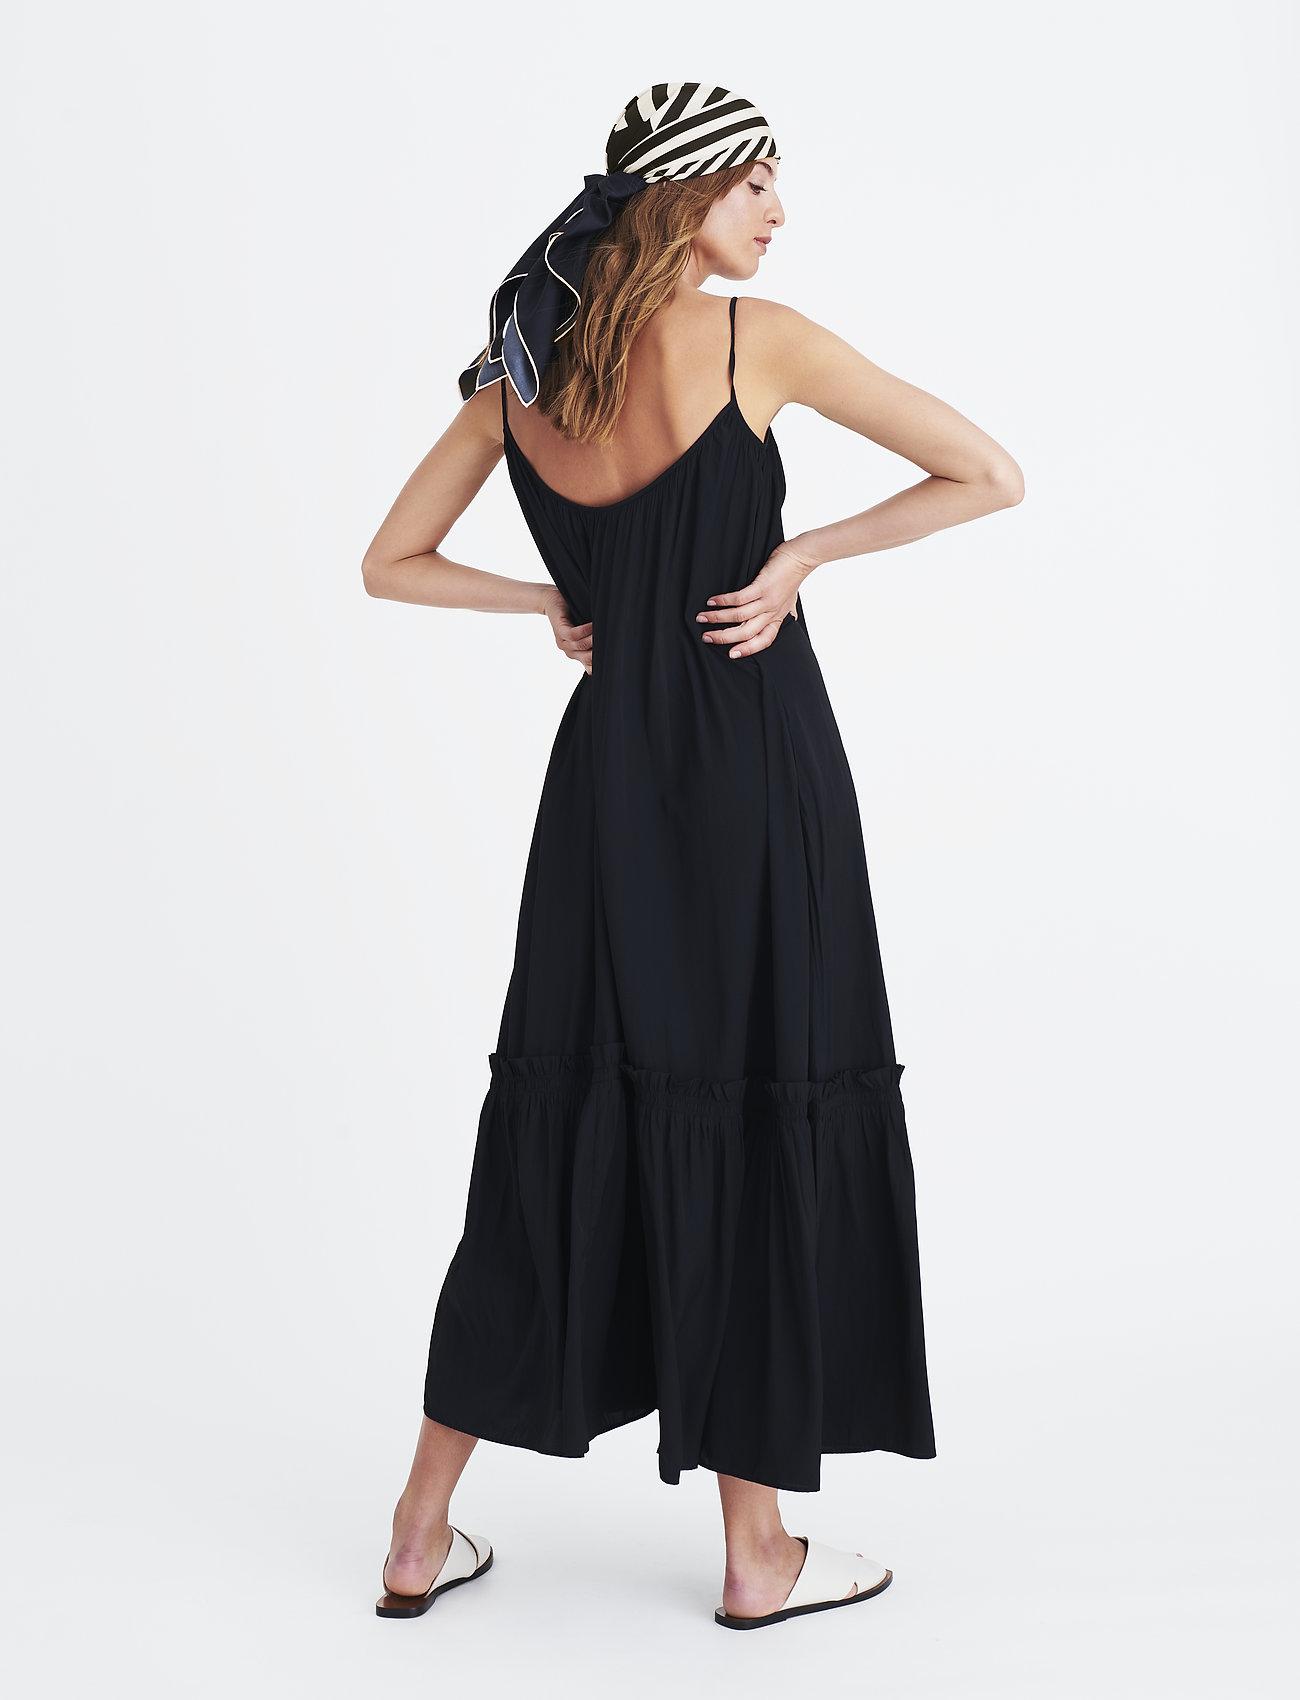 Rome Strap Dress (Black) (1924.45 kr) - Elle Style Awards Collection 2019